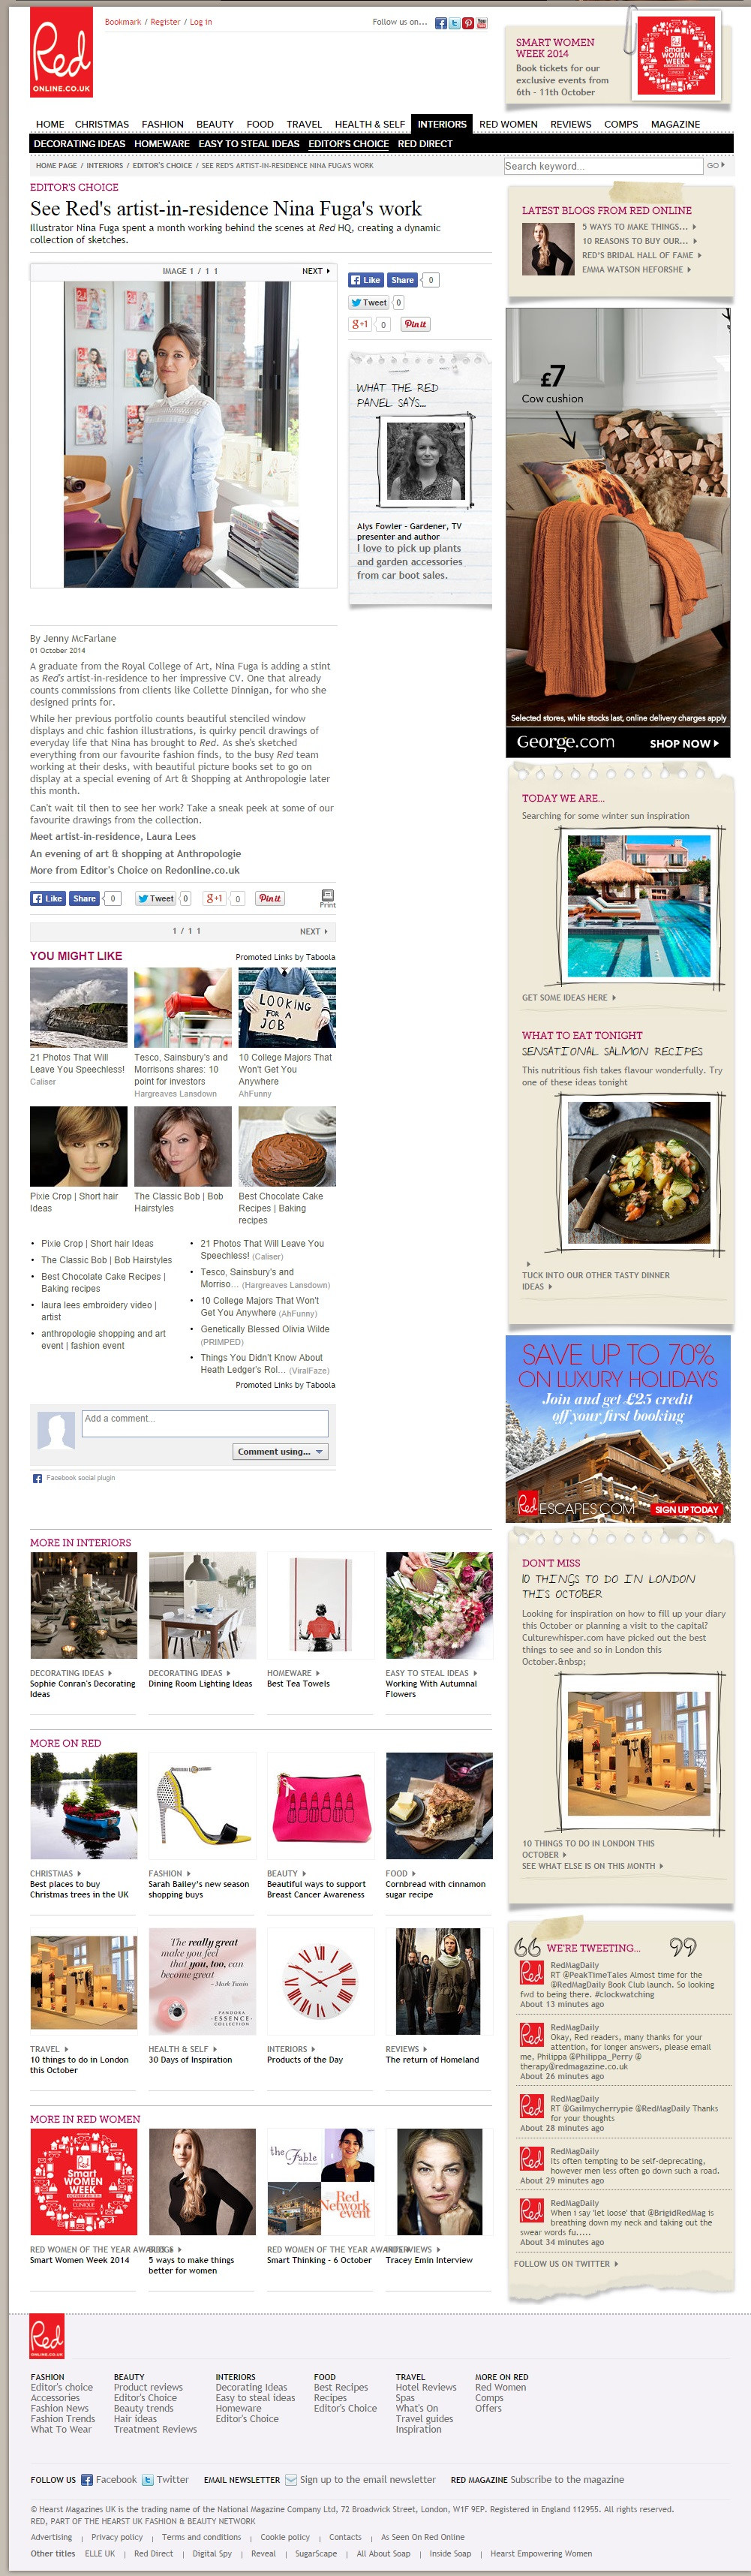 screencapture-www-redonline-co-uk-interiors-editor-s-choice-illustrator-nina-fuga